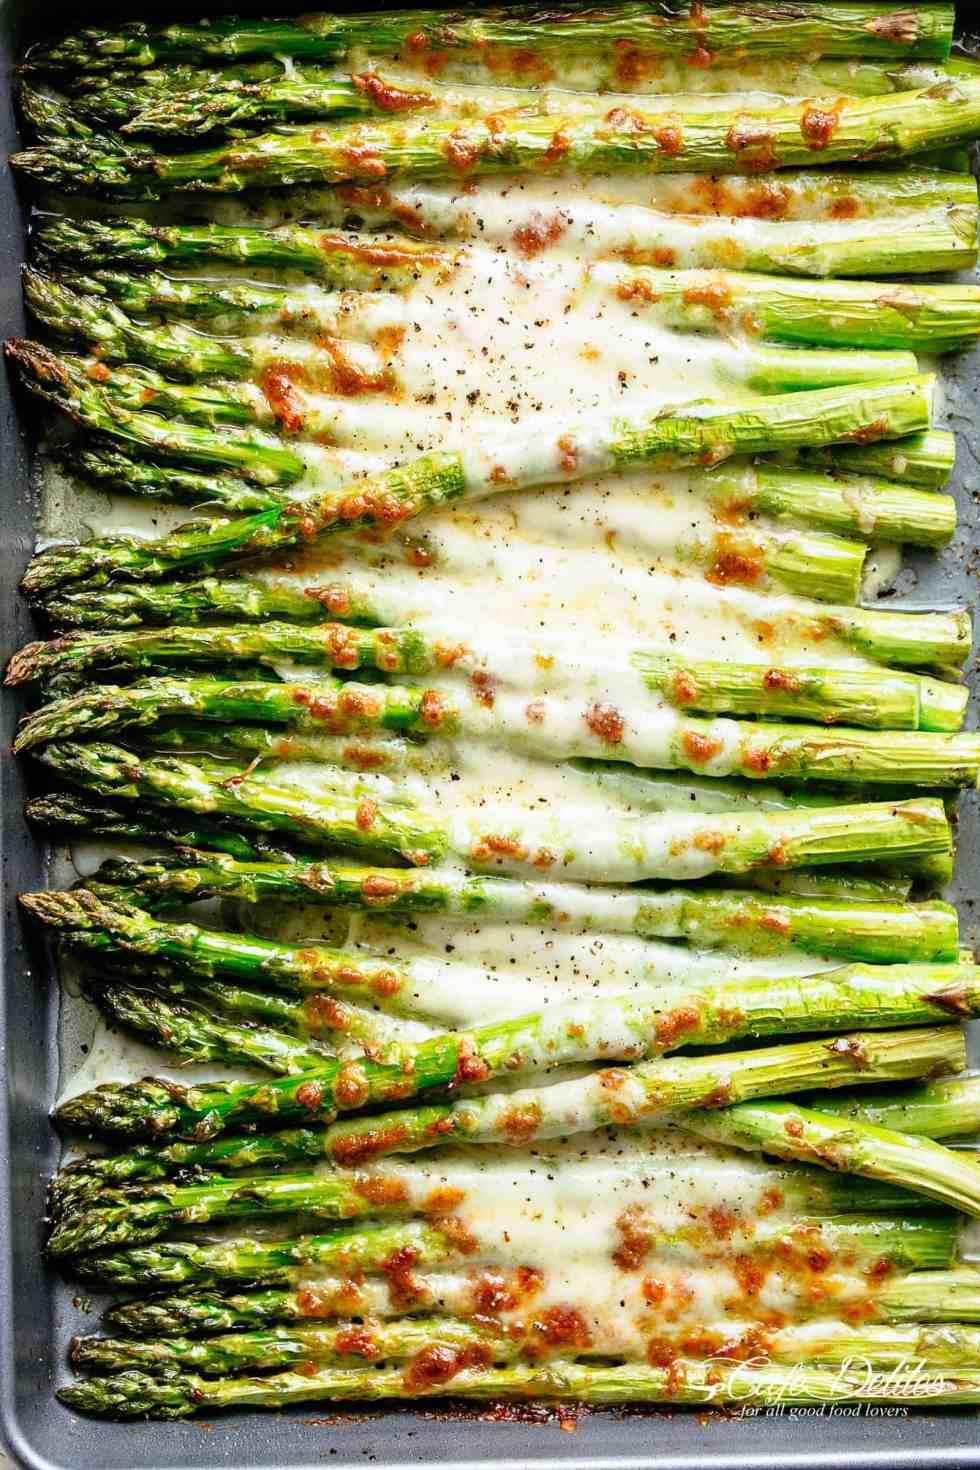 Garlic Asparagus Recipes Balsamic Vinegar